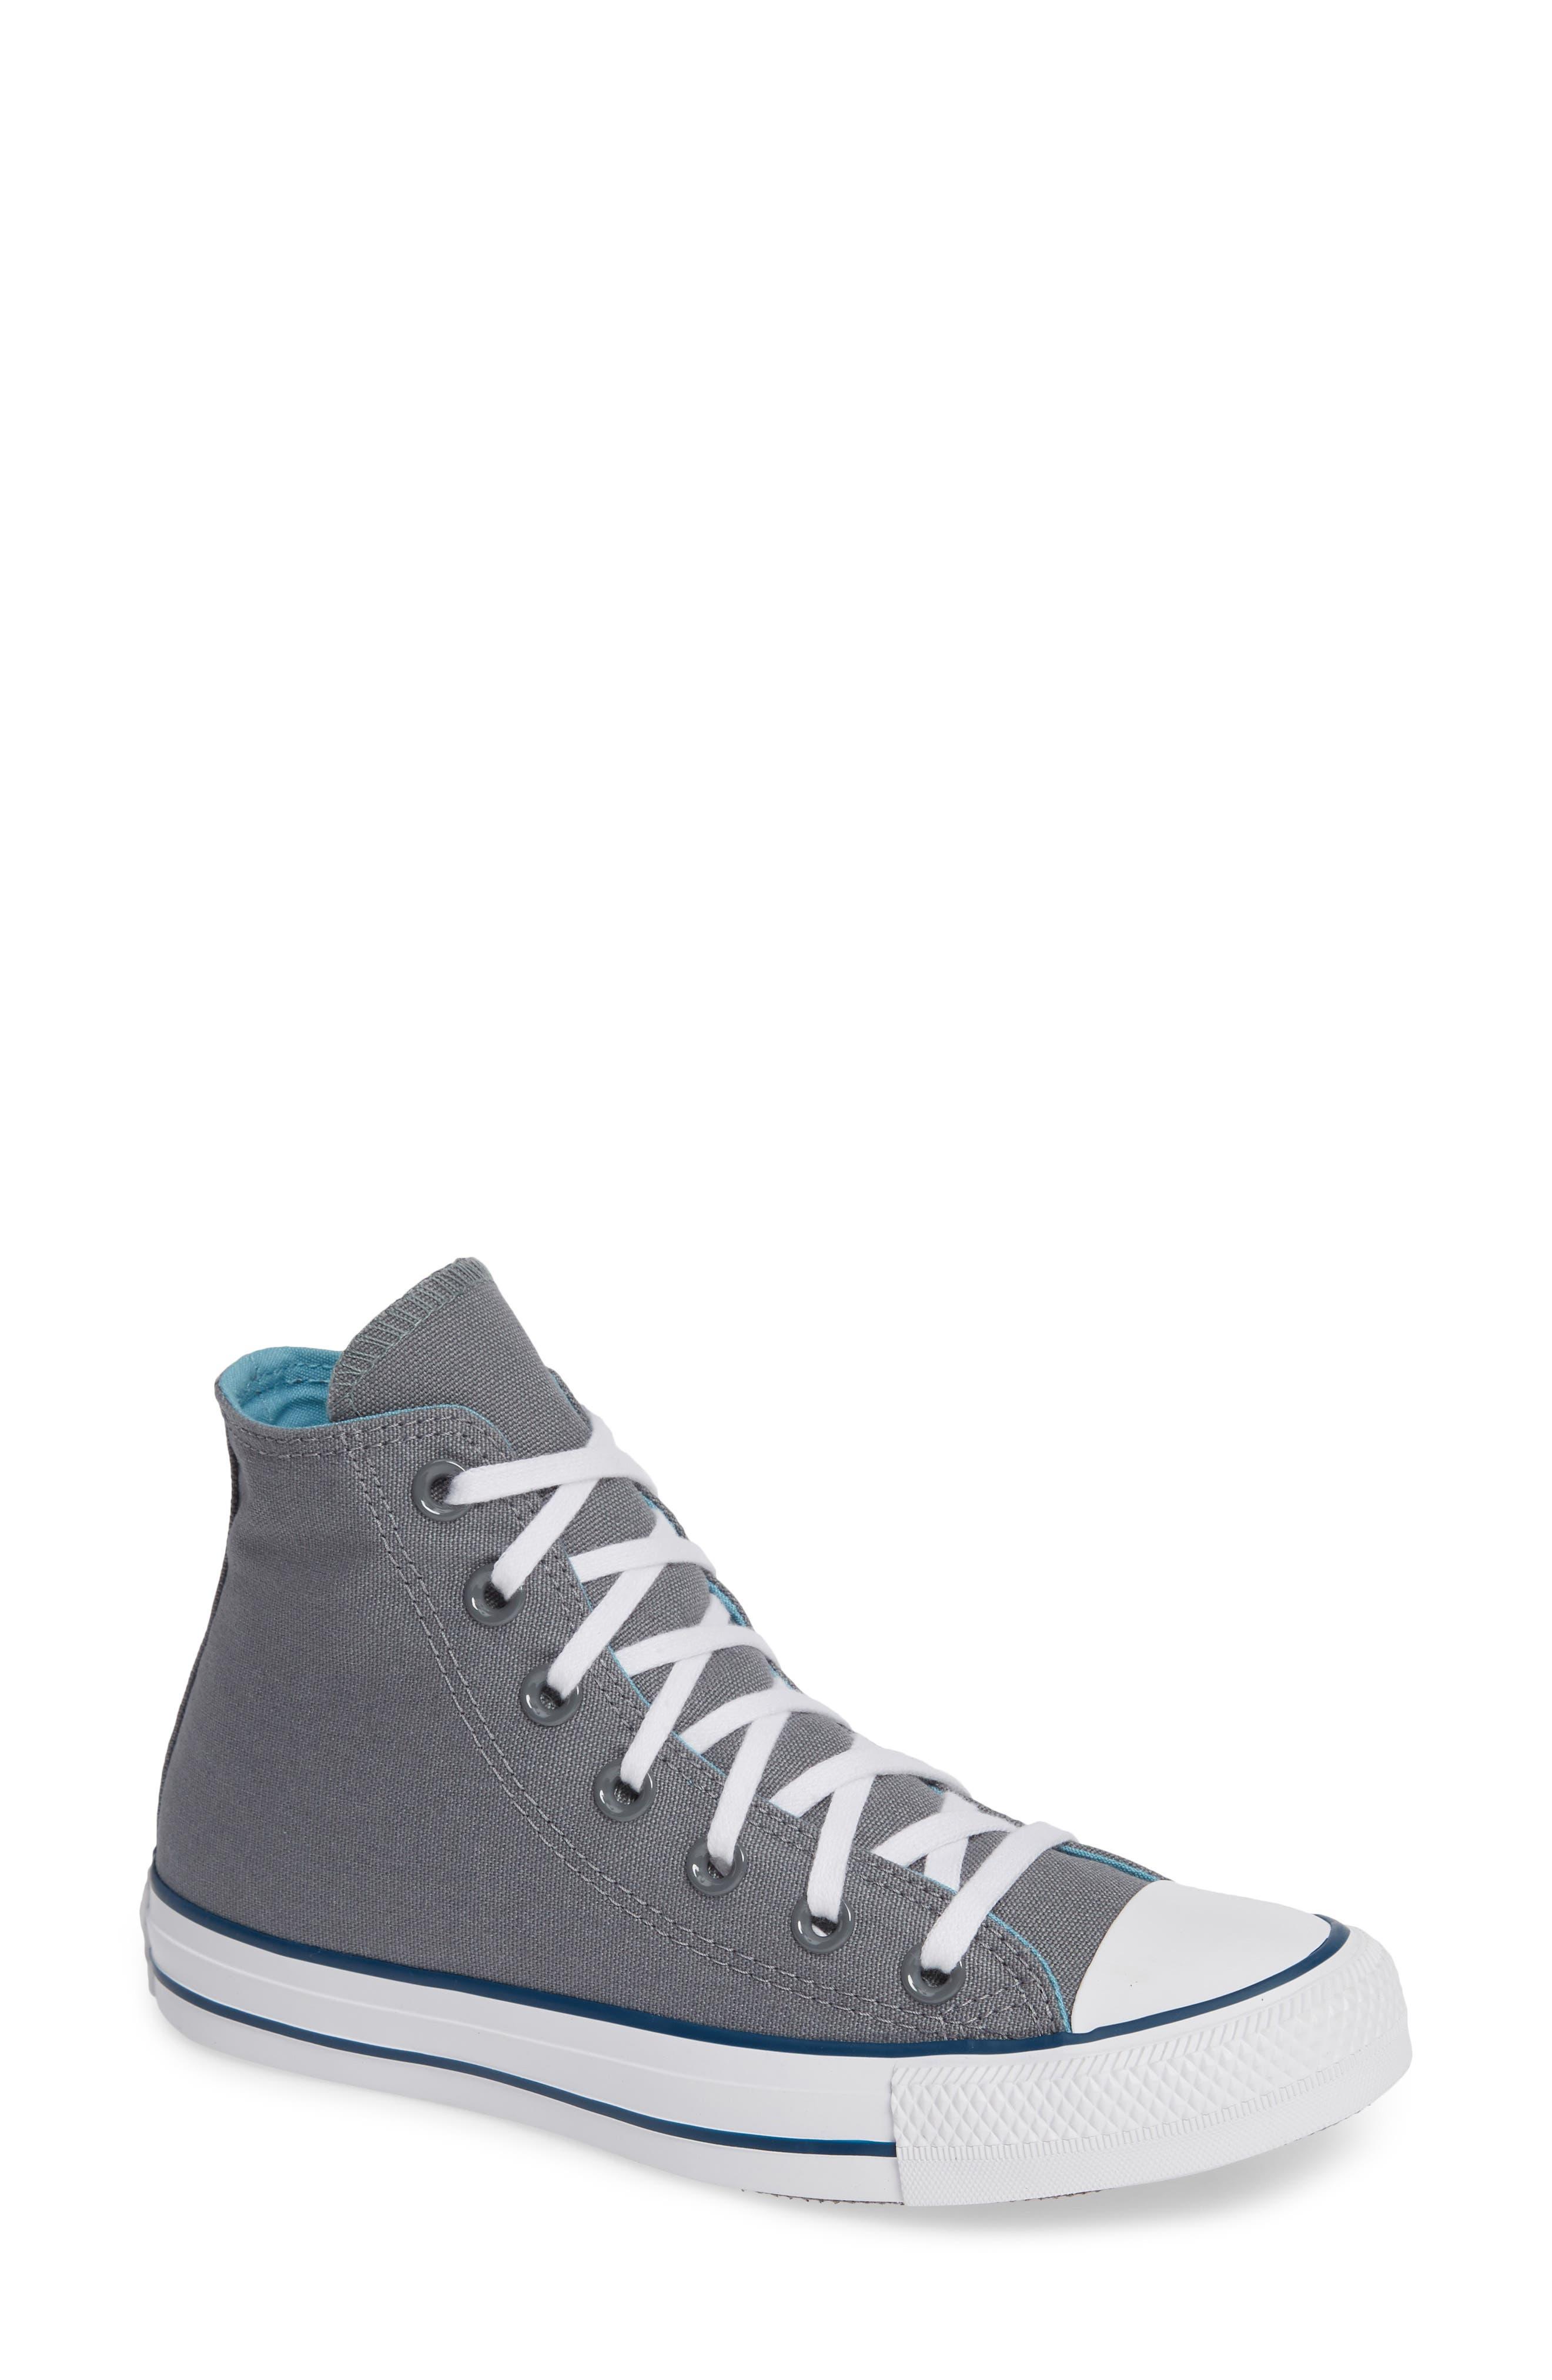 CONVERSE Chuck Taylor<sup>®</sup> All Star<sup>®</sup> Seasonal Hi Sneaker, Main, color, 039